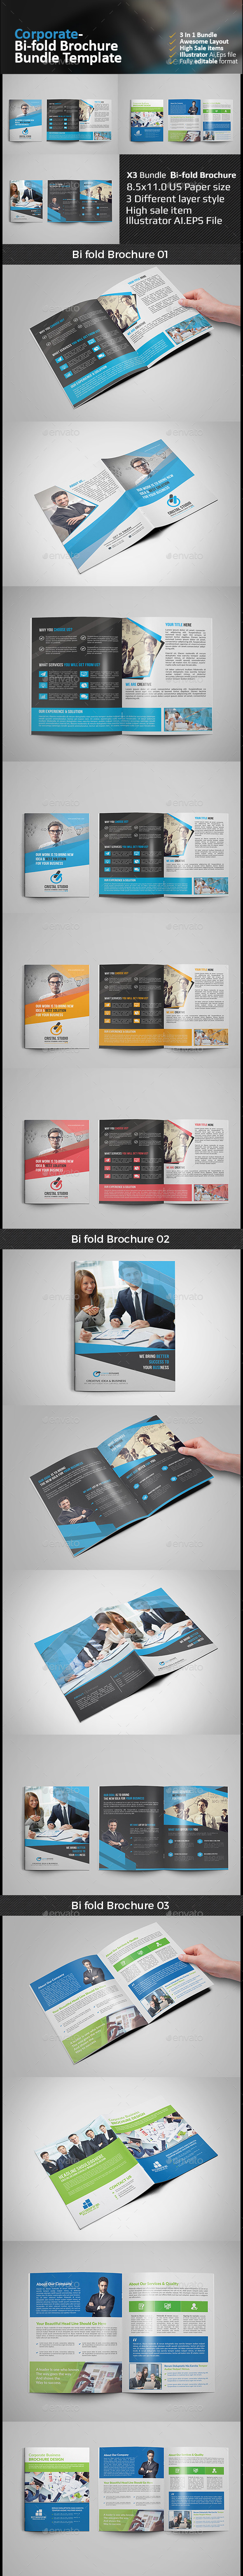 Brochure Bundle Pack - Corporate Brochures